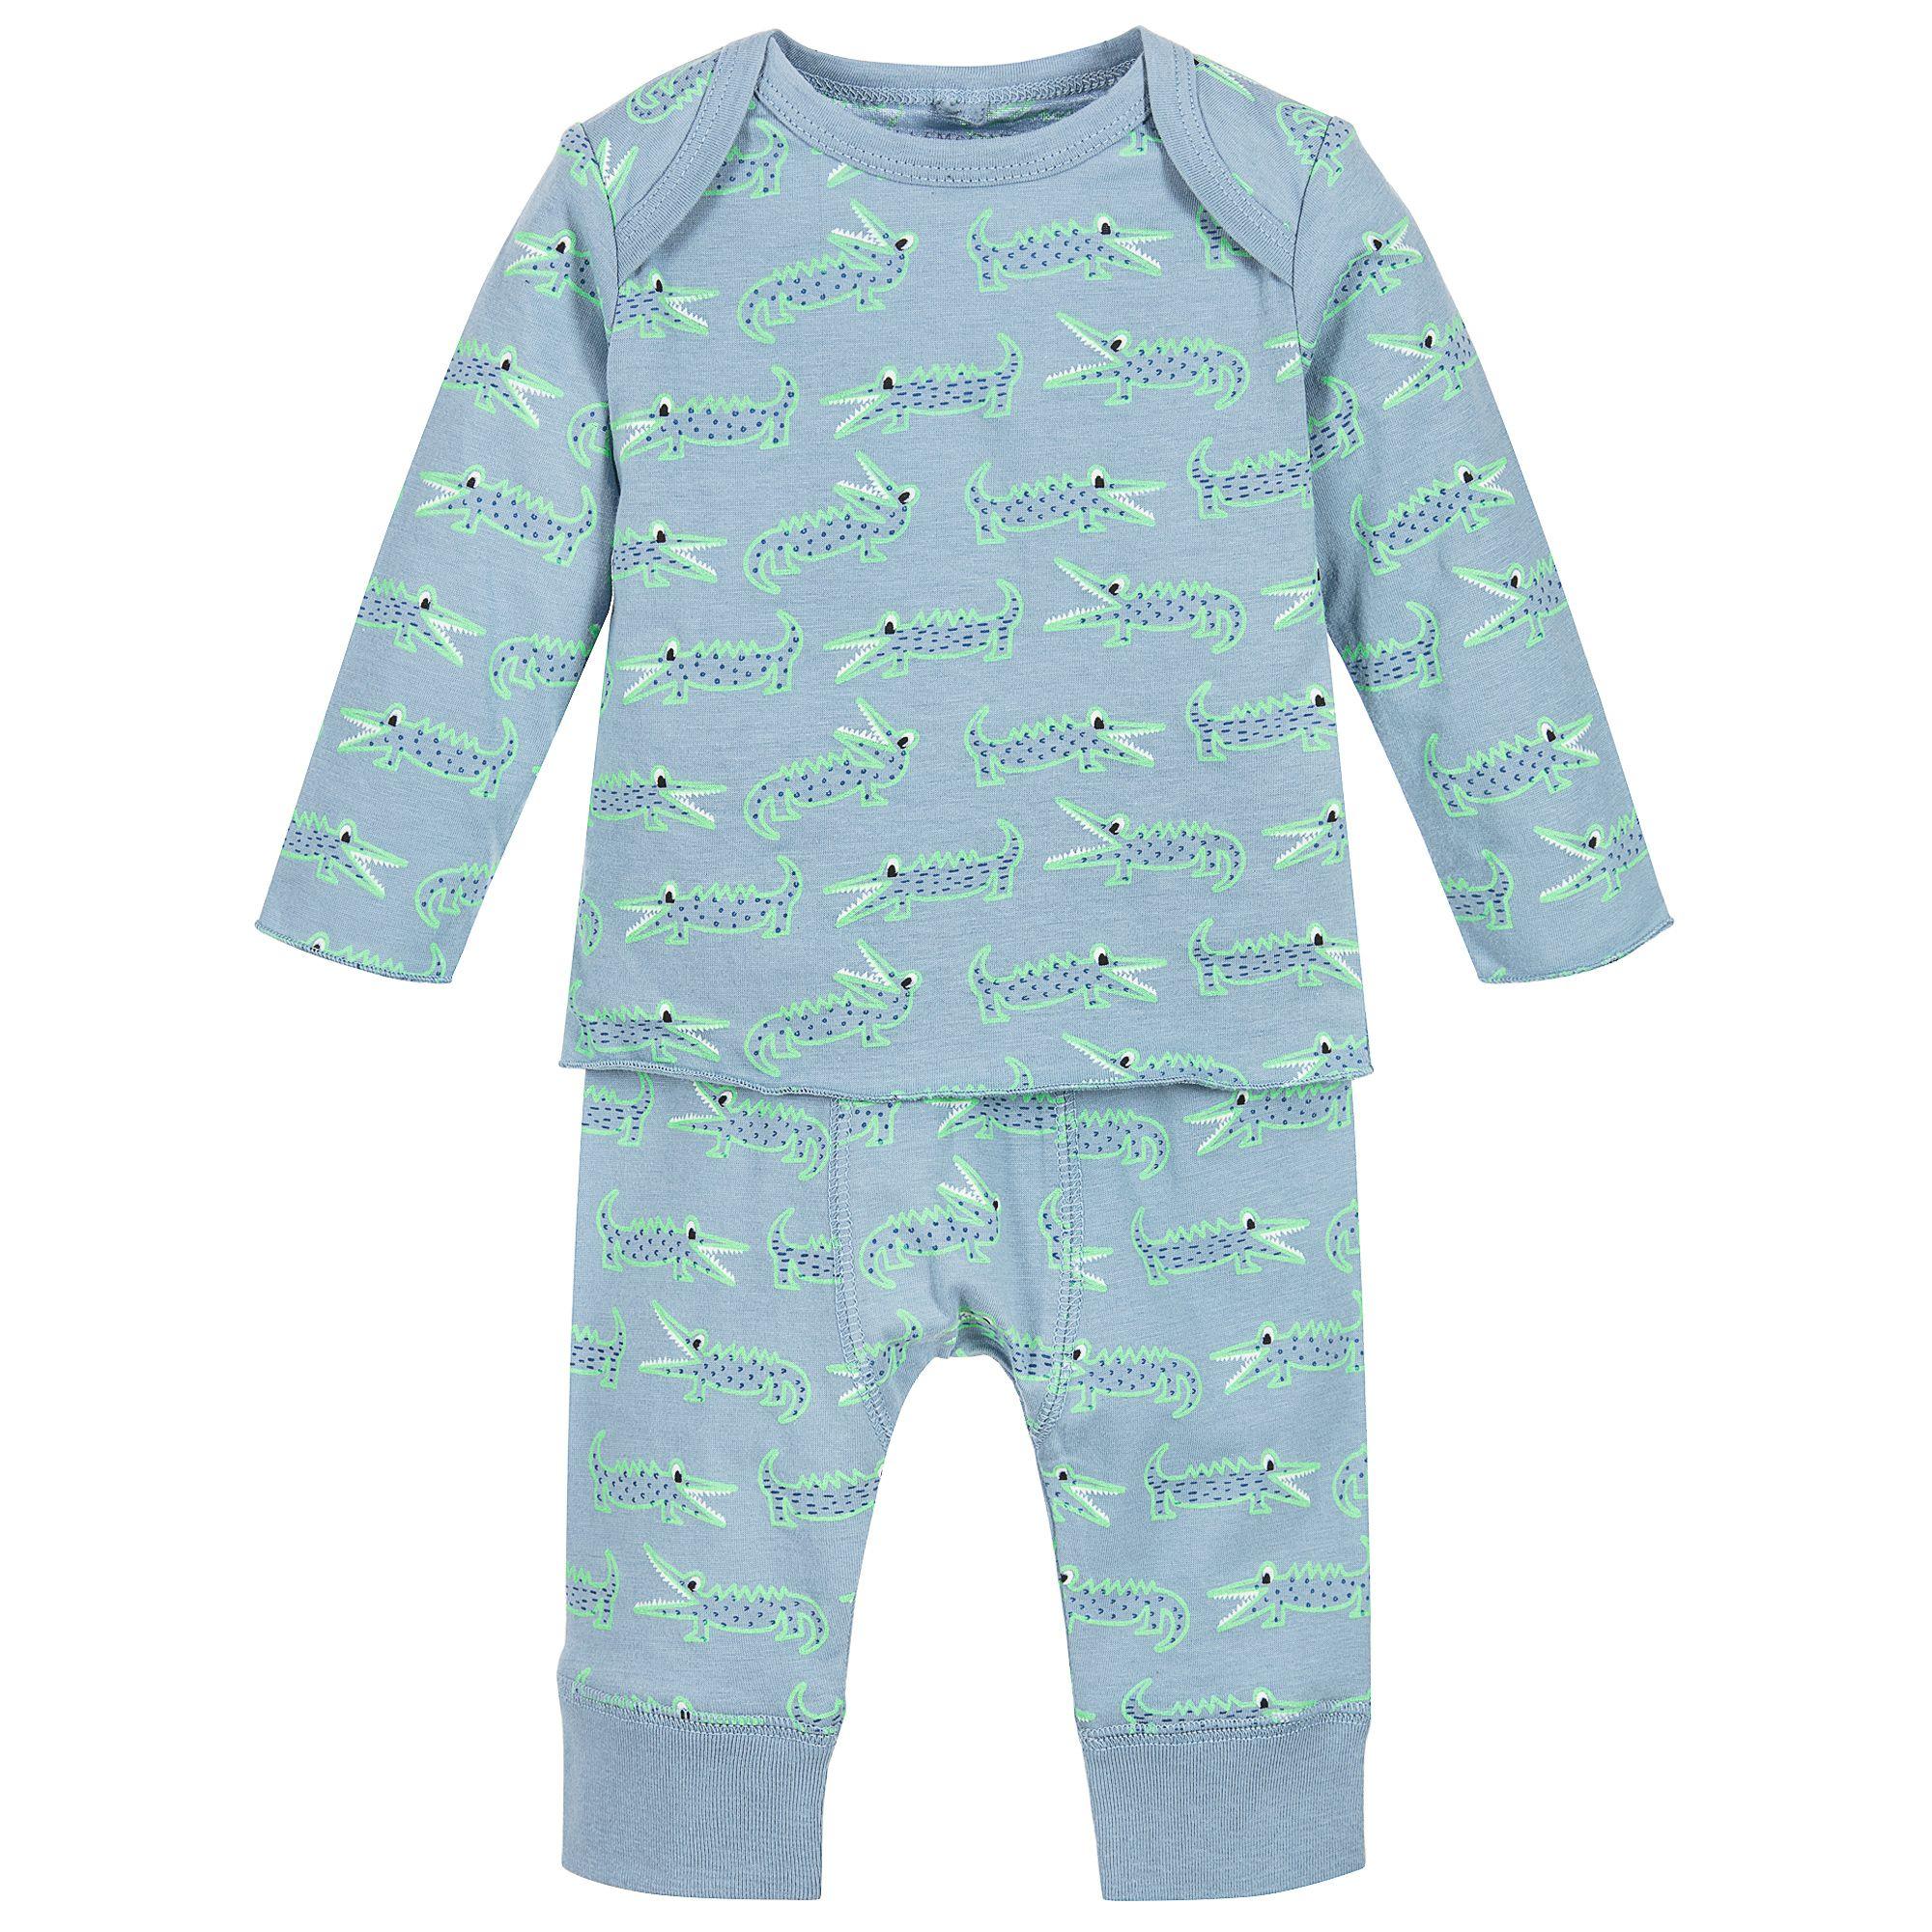 9d20a68967 Blue two piece babygrow by Stella McCartney Kids